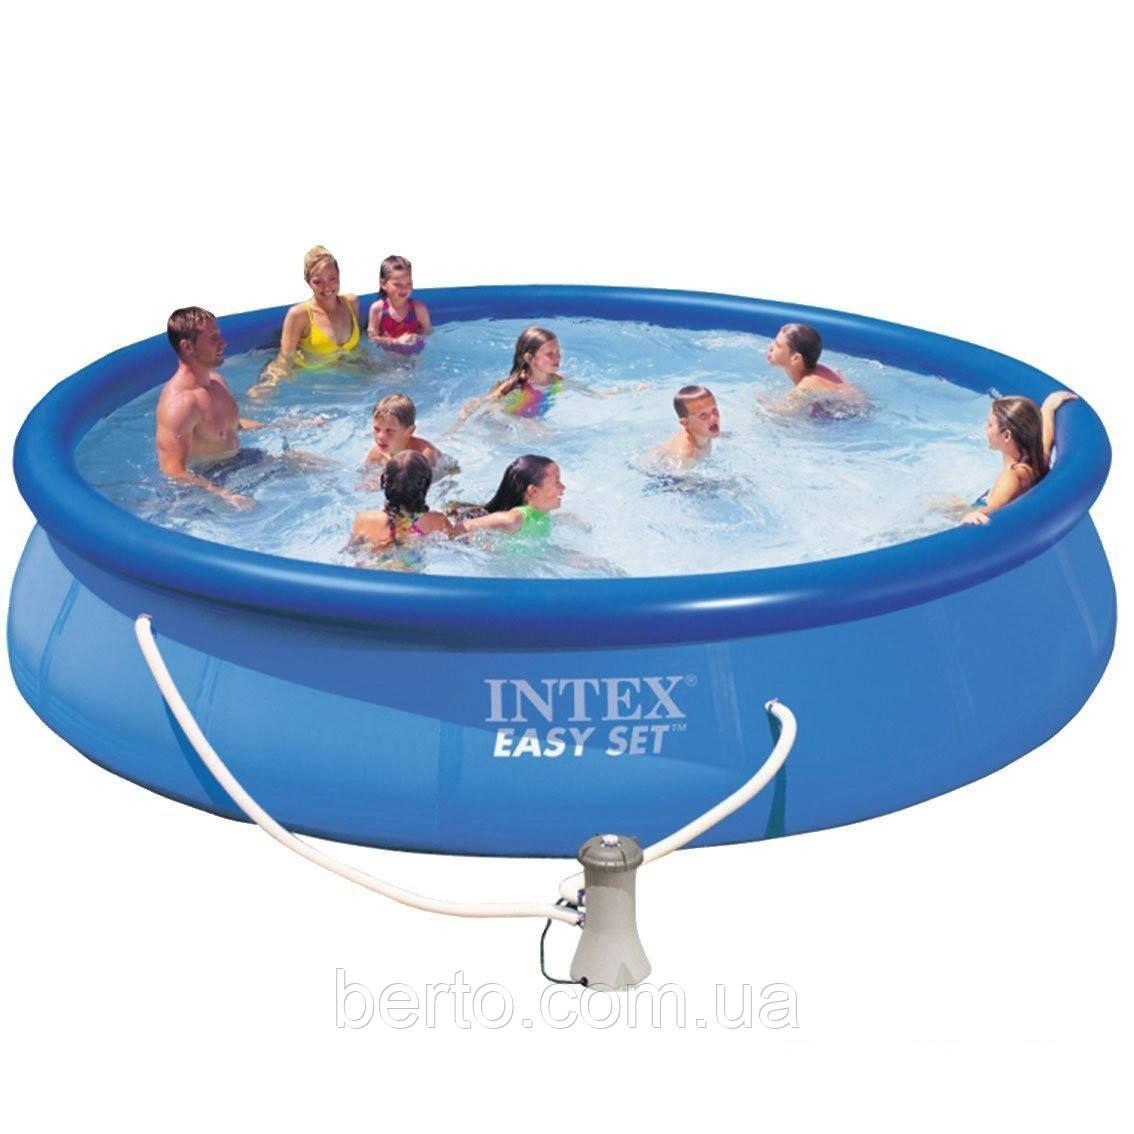 Надувной басейн intex 28158 Easy set 457 х 84 см.